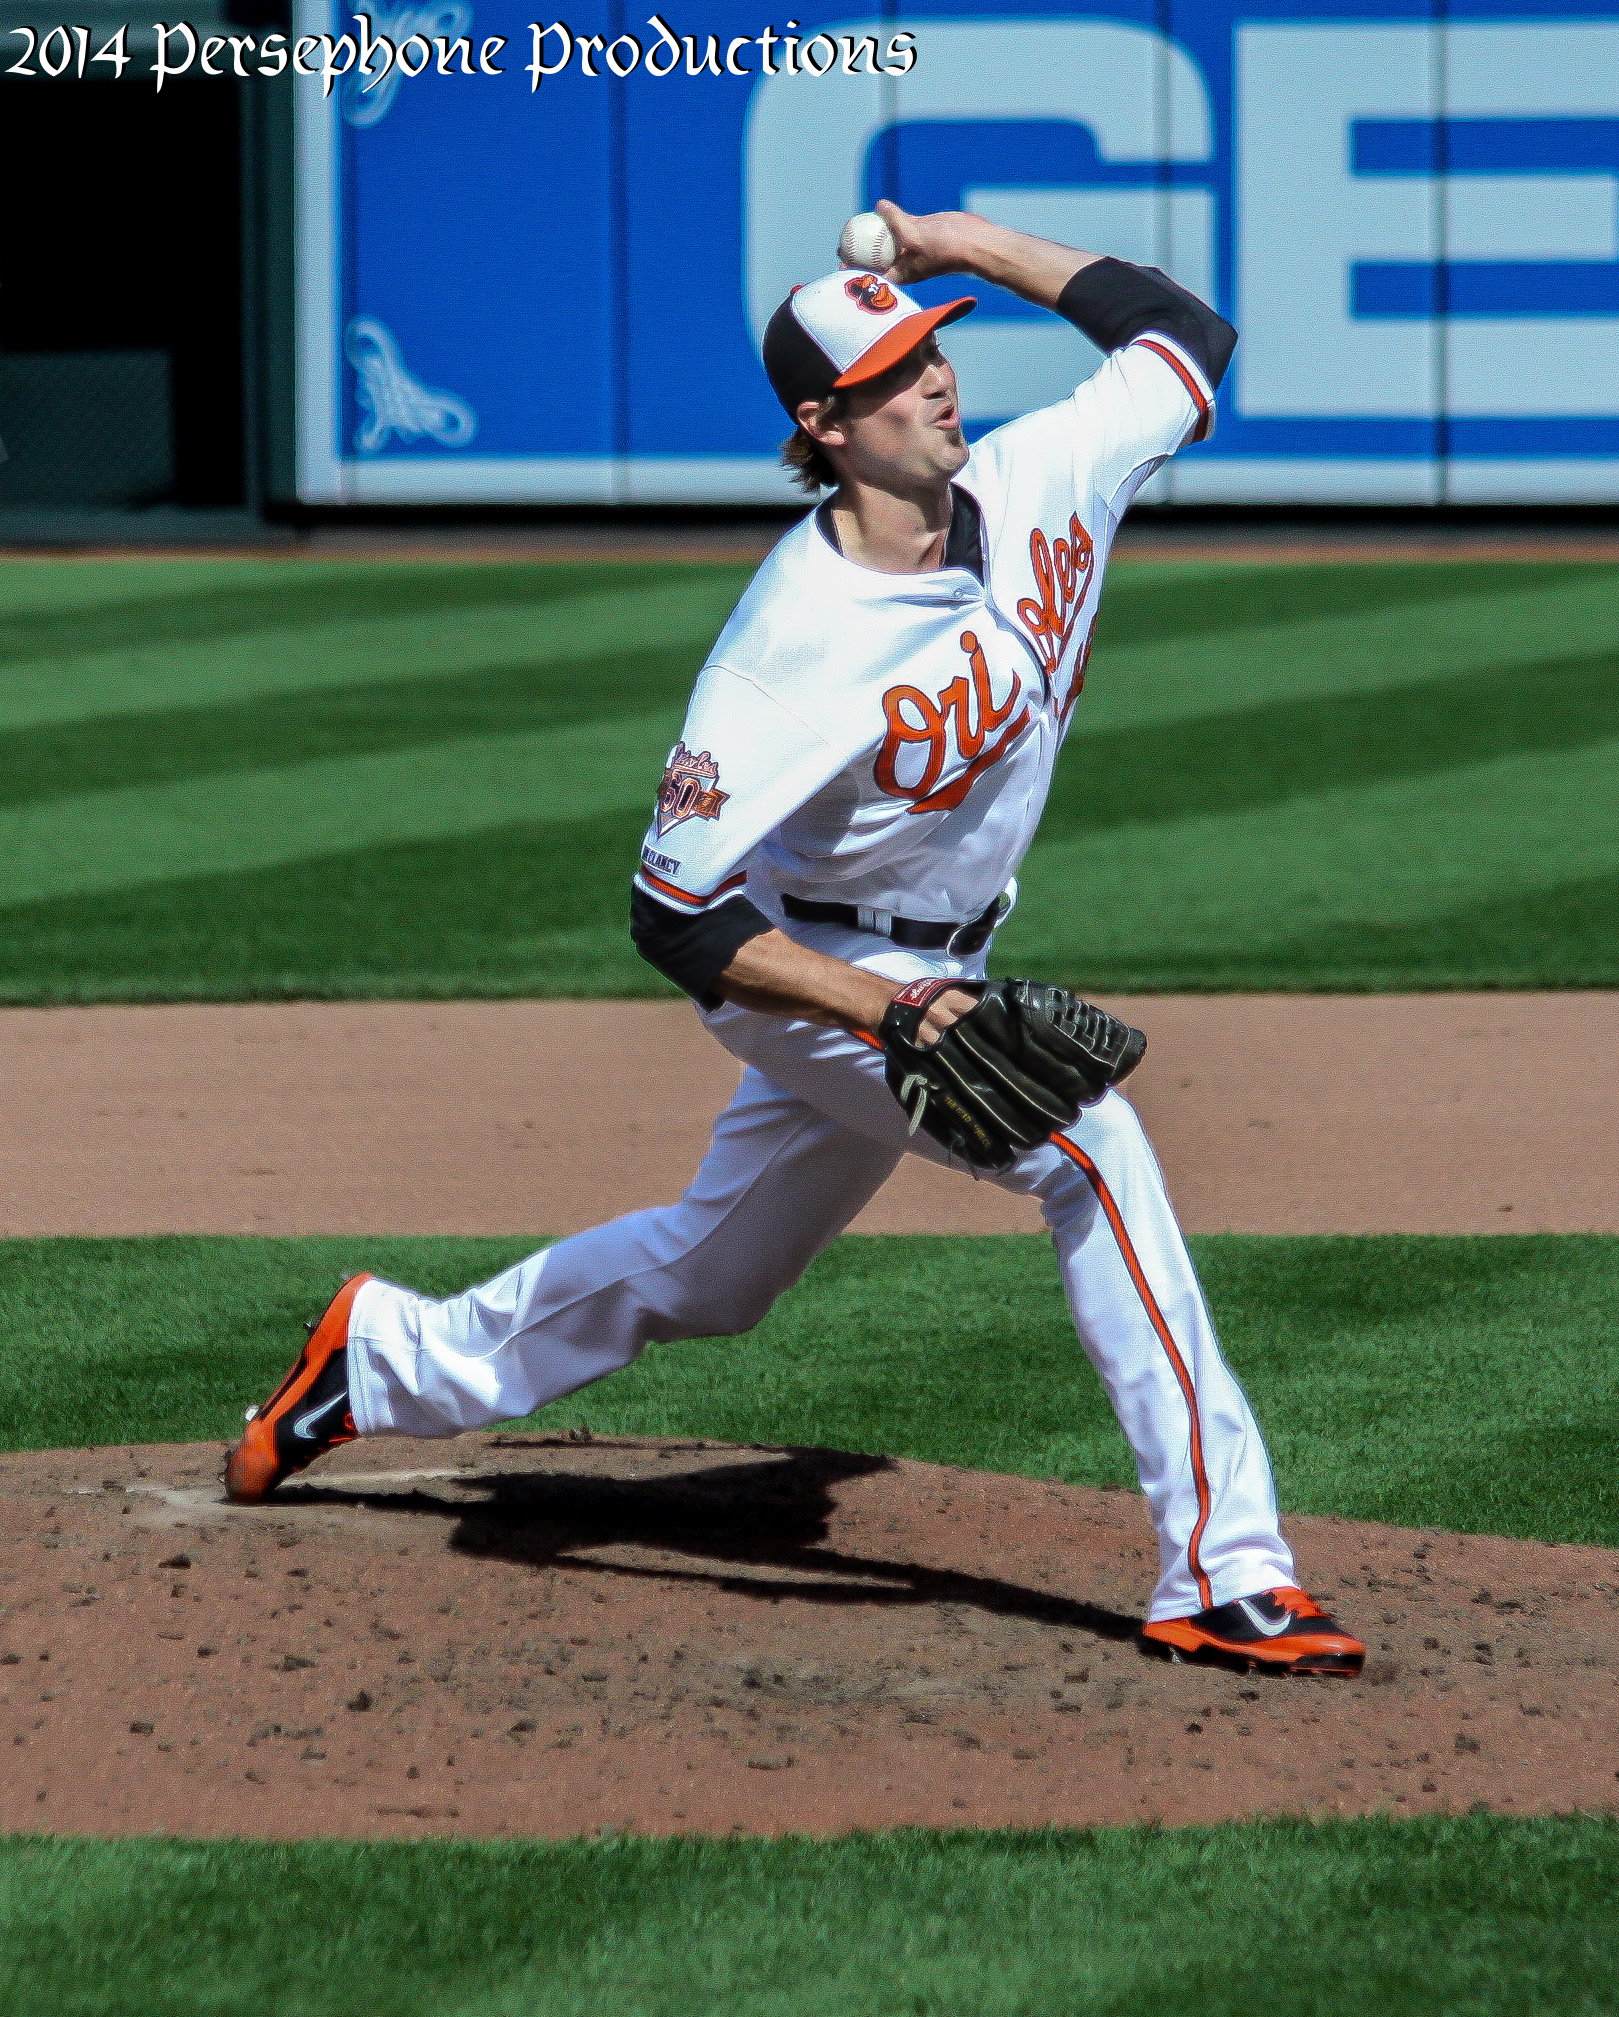 Kevin Gausman, Baltimore Orioles